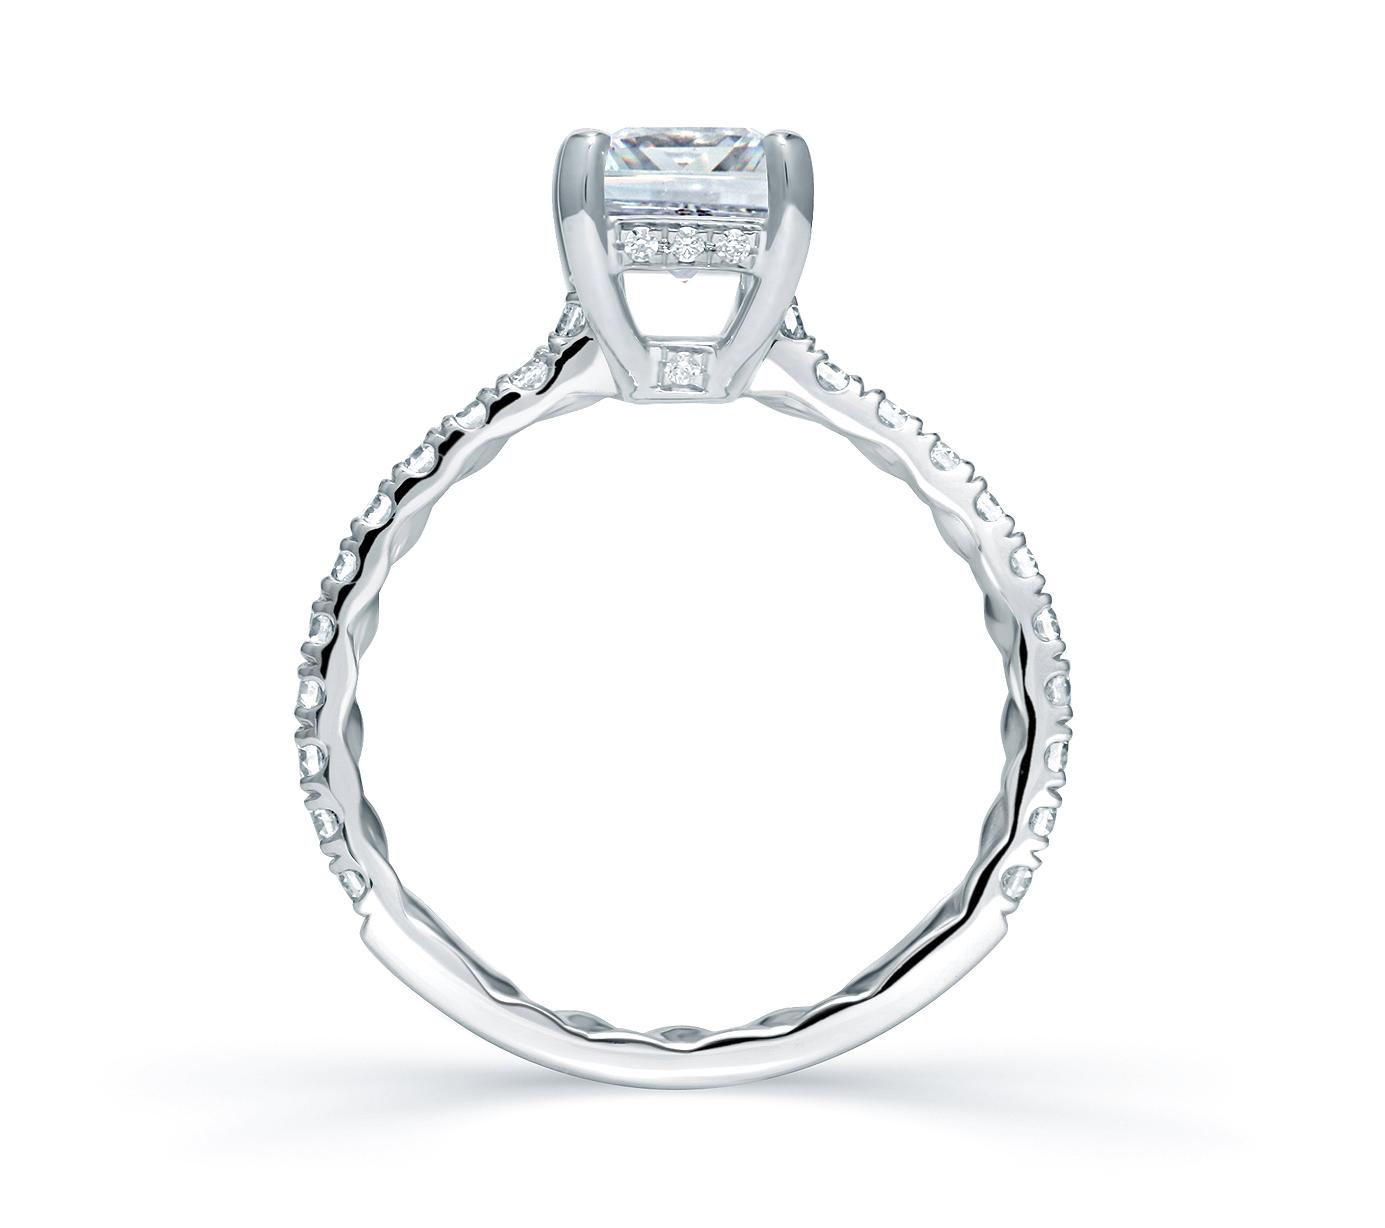 A.Jaffe Rings | Van Gundys | Ventura, CA Jewelers